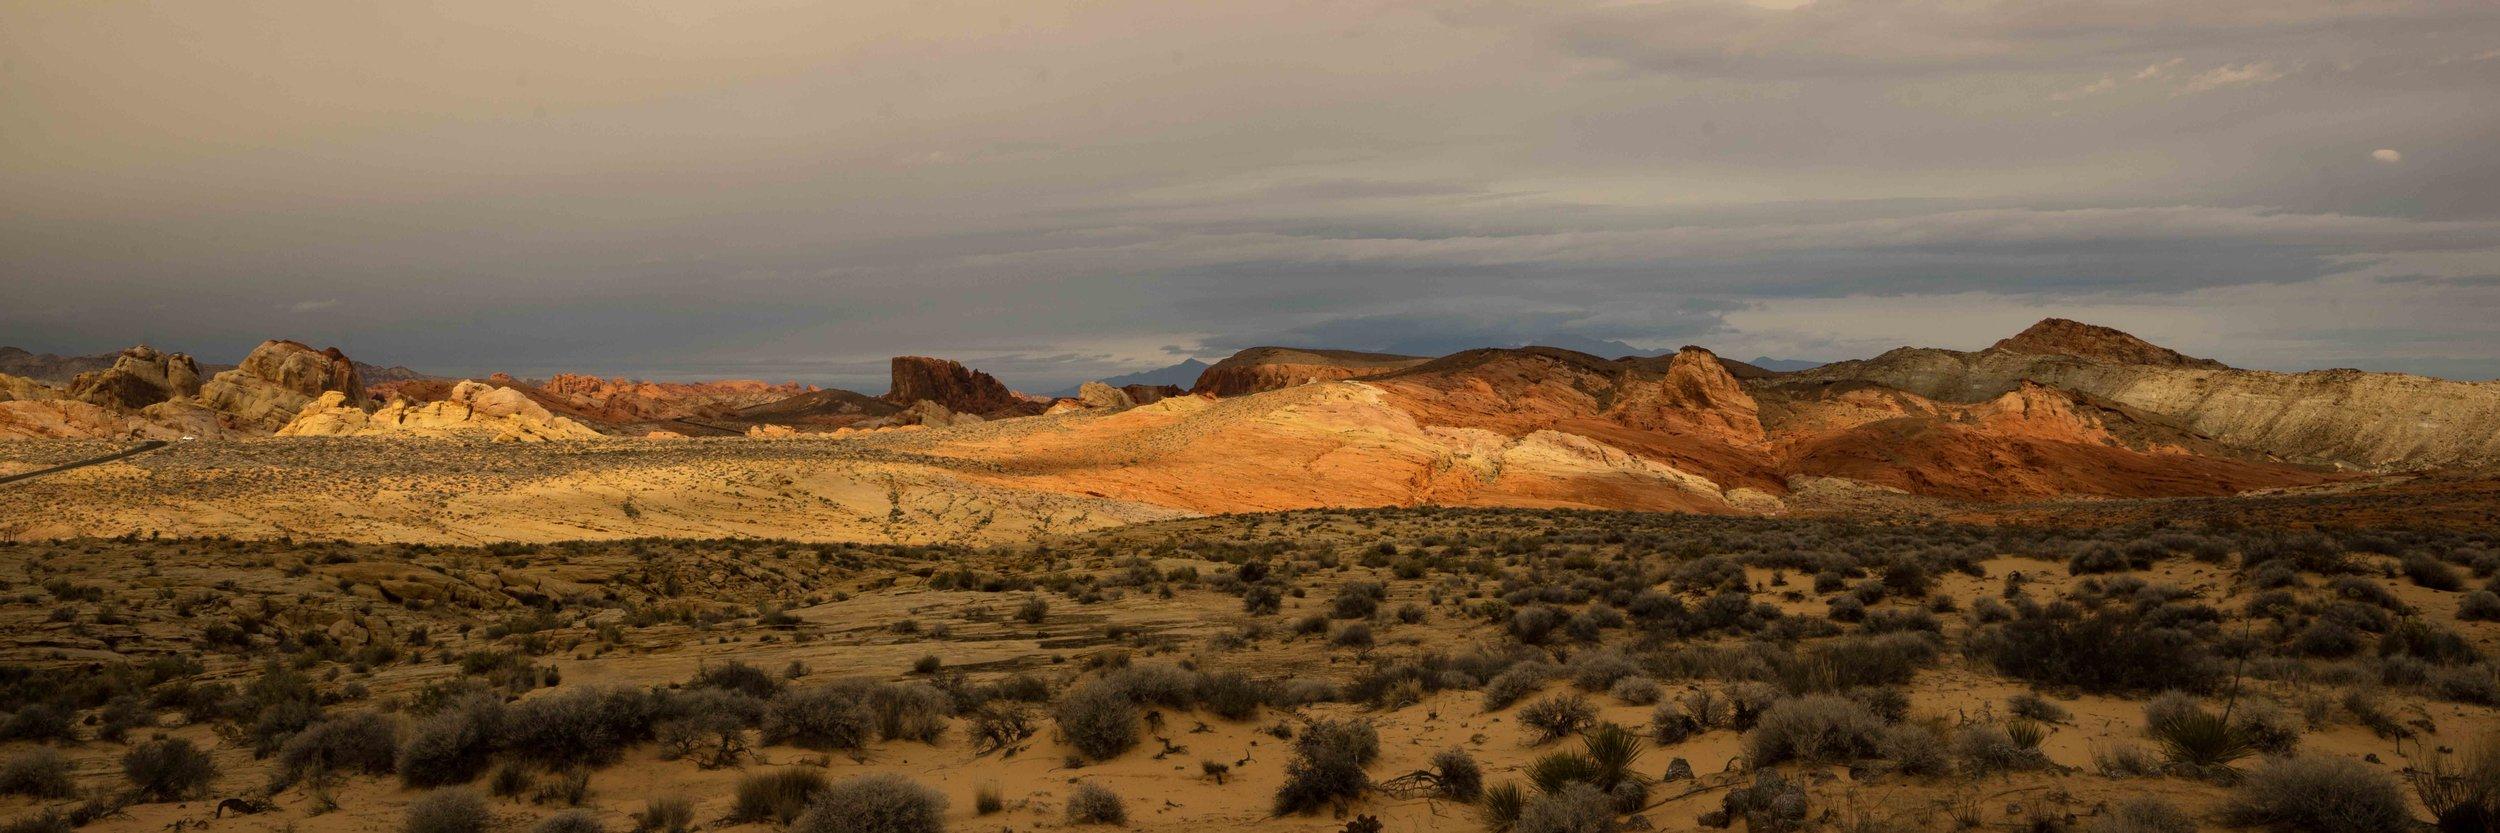 Valley of Fire 2.jpg